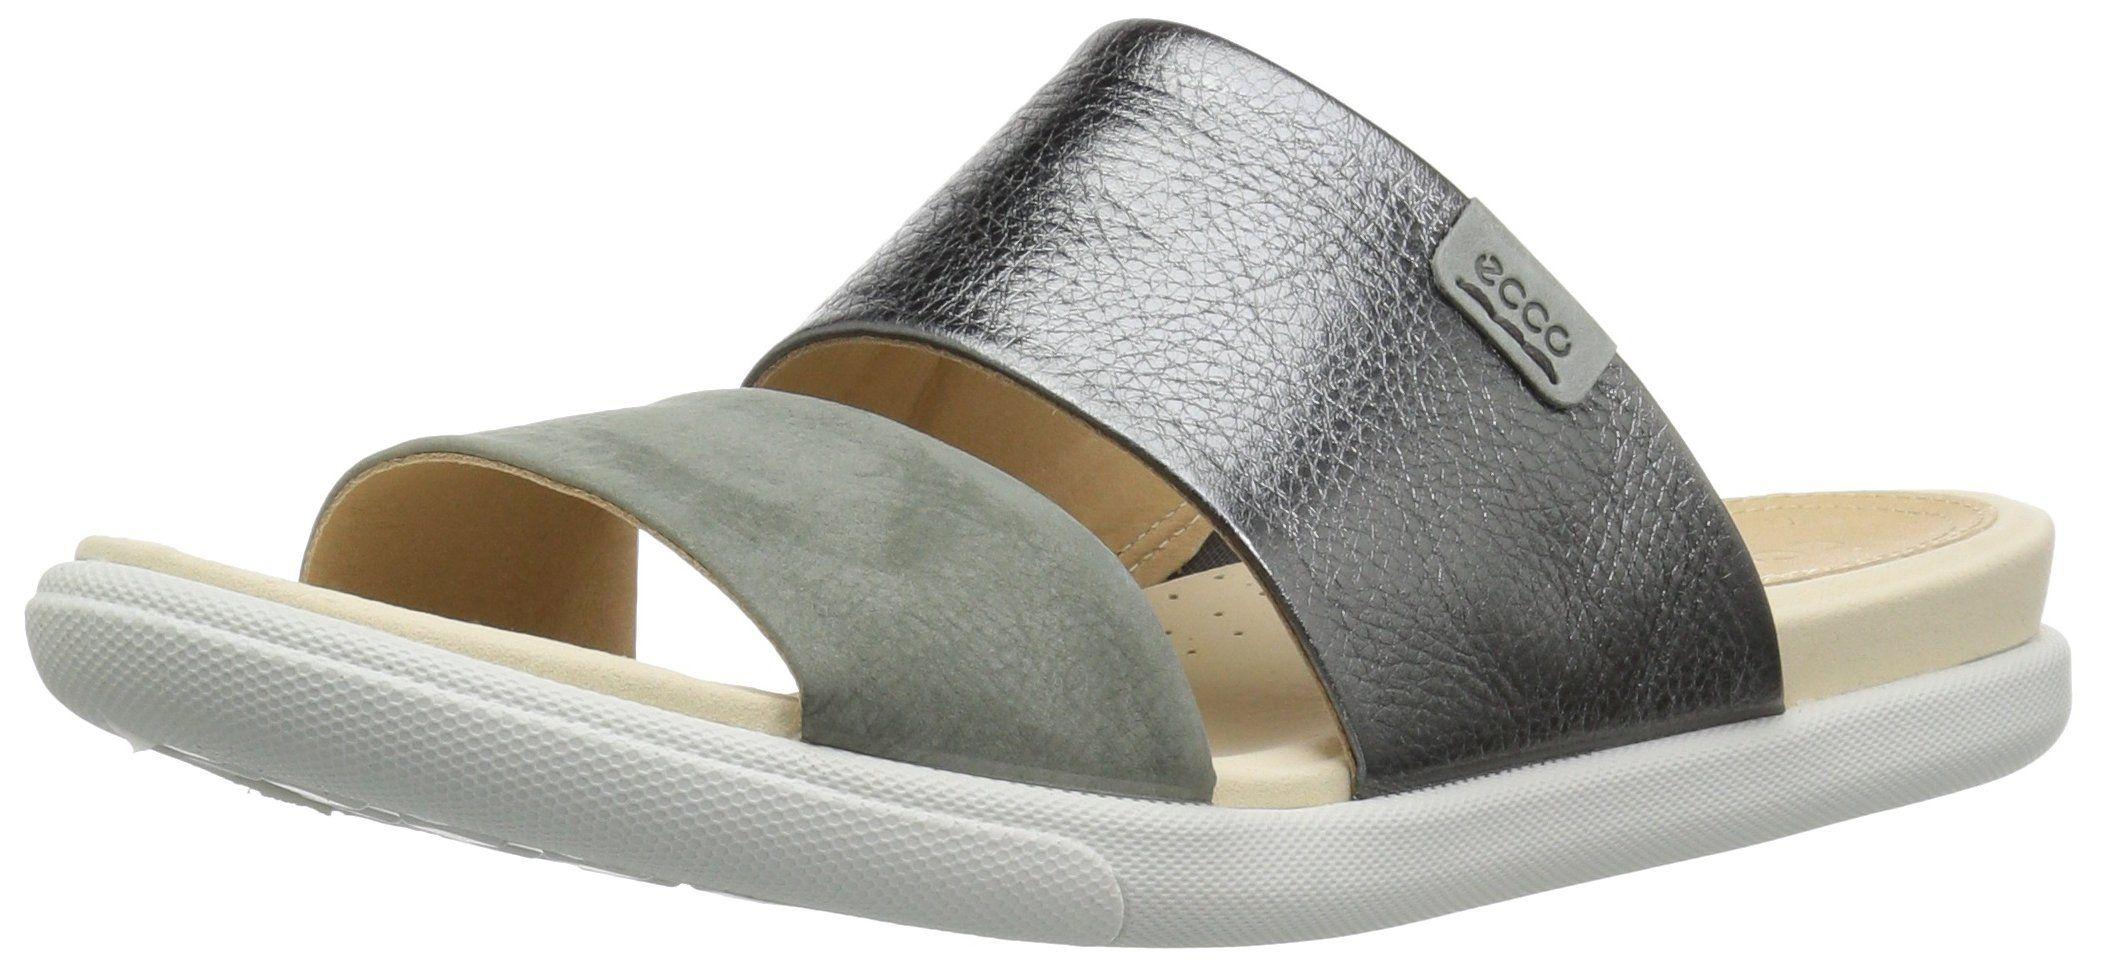 Ecco Women S Damara Slide Ii Sandal See This Great Product